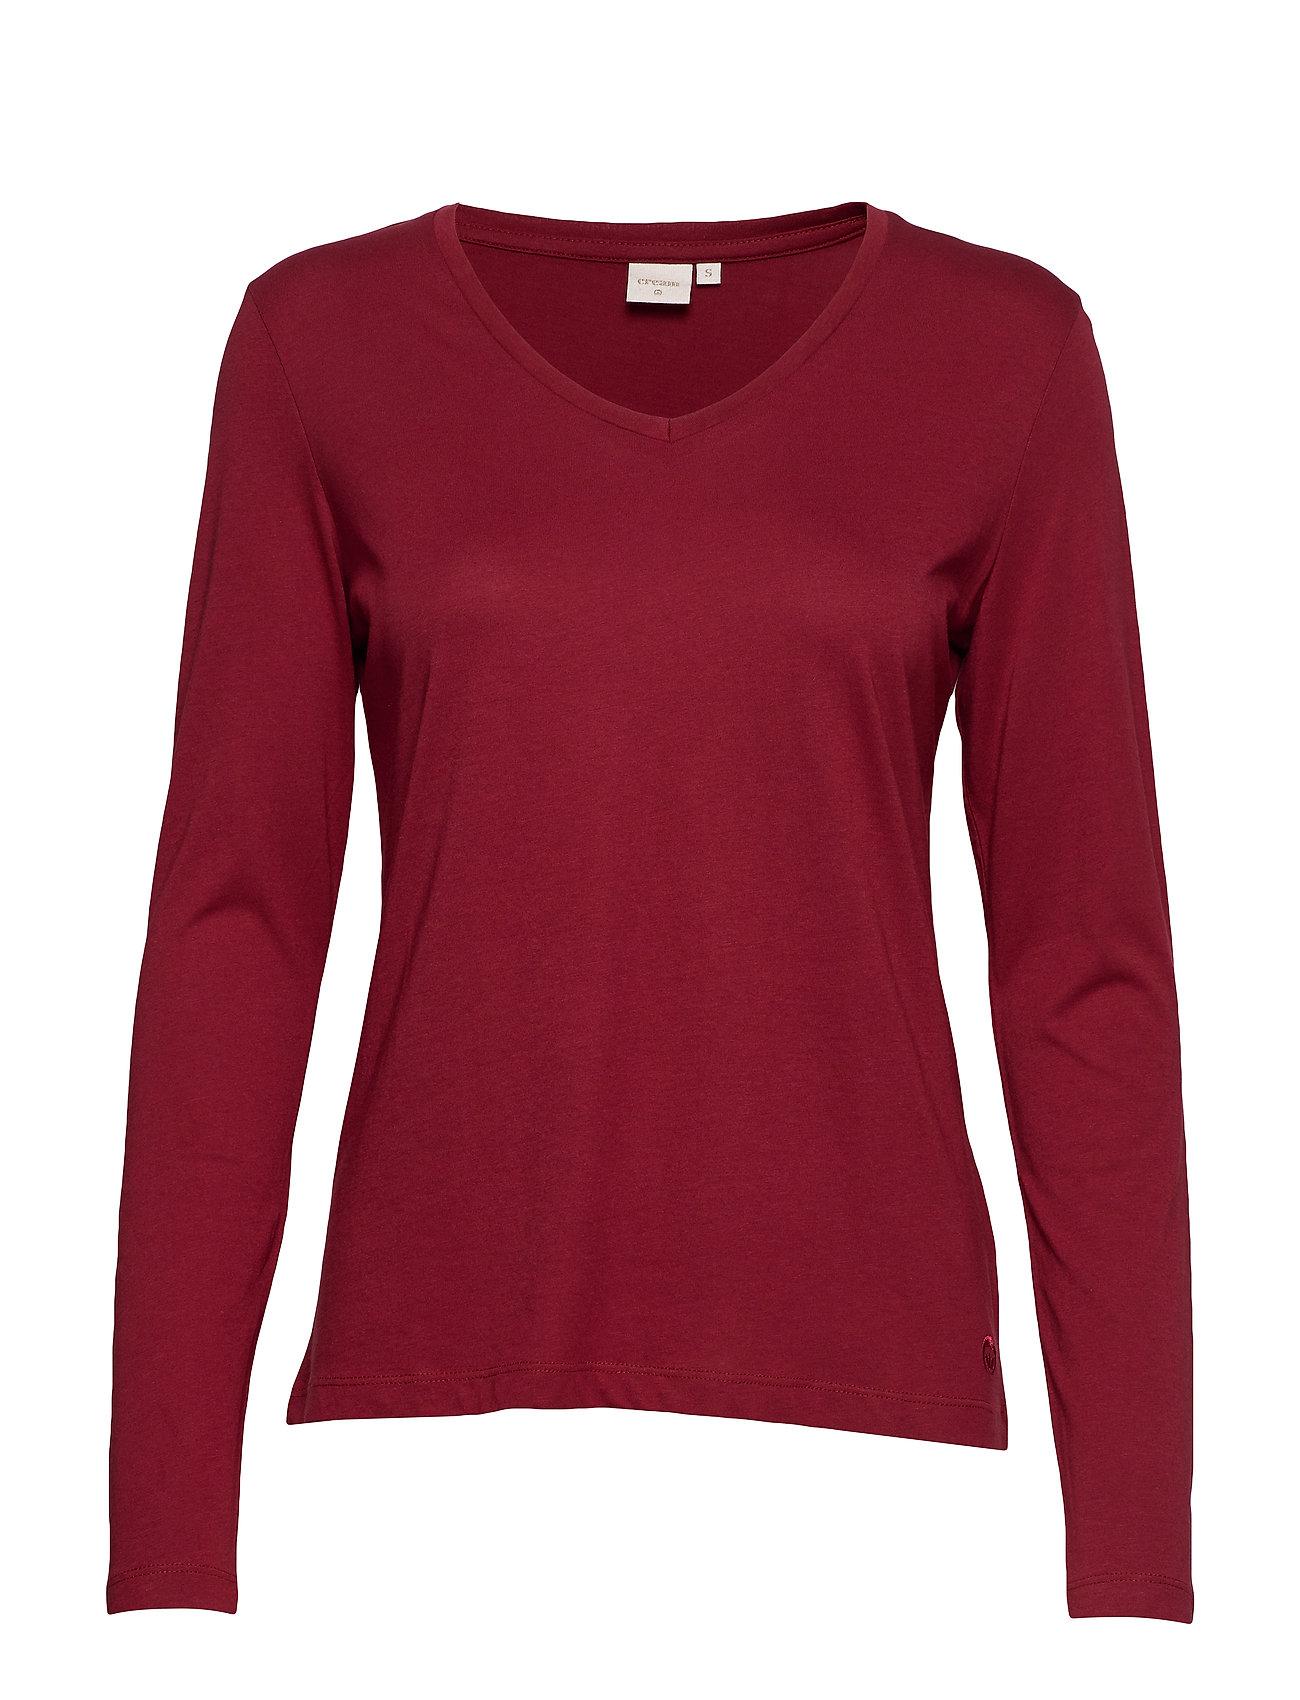 Cream Naia long sleeve T-shirt - MERLOT RED